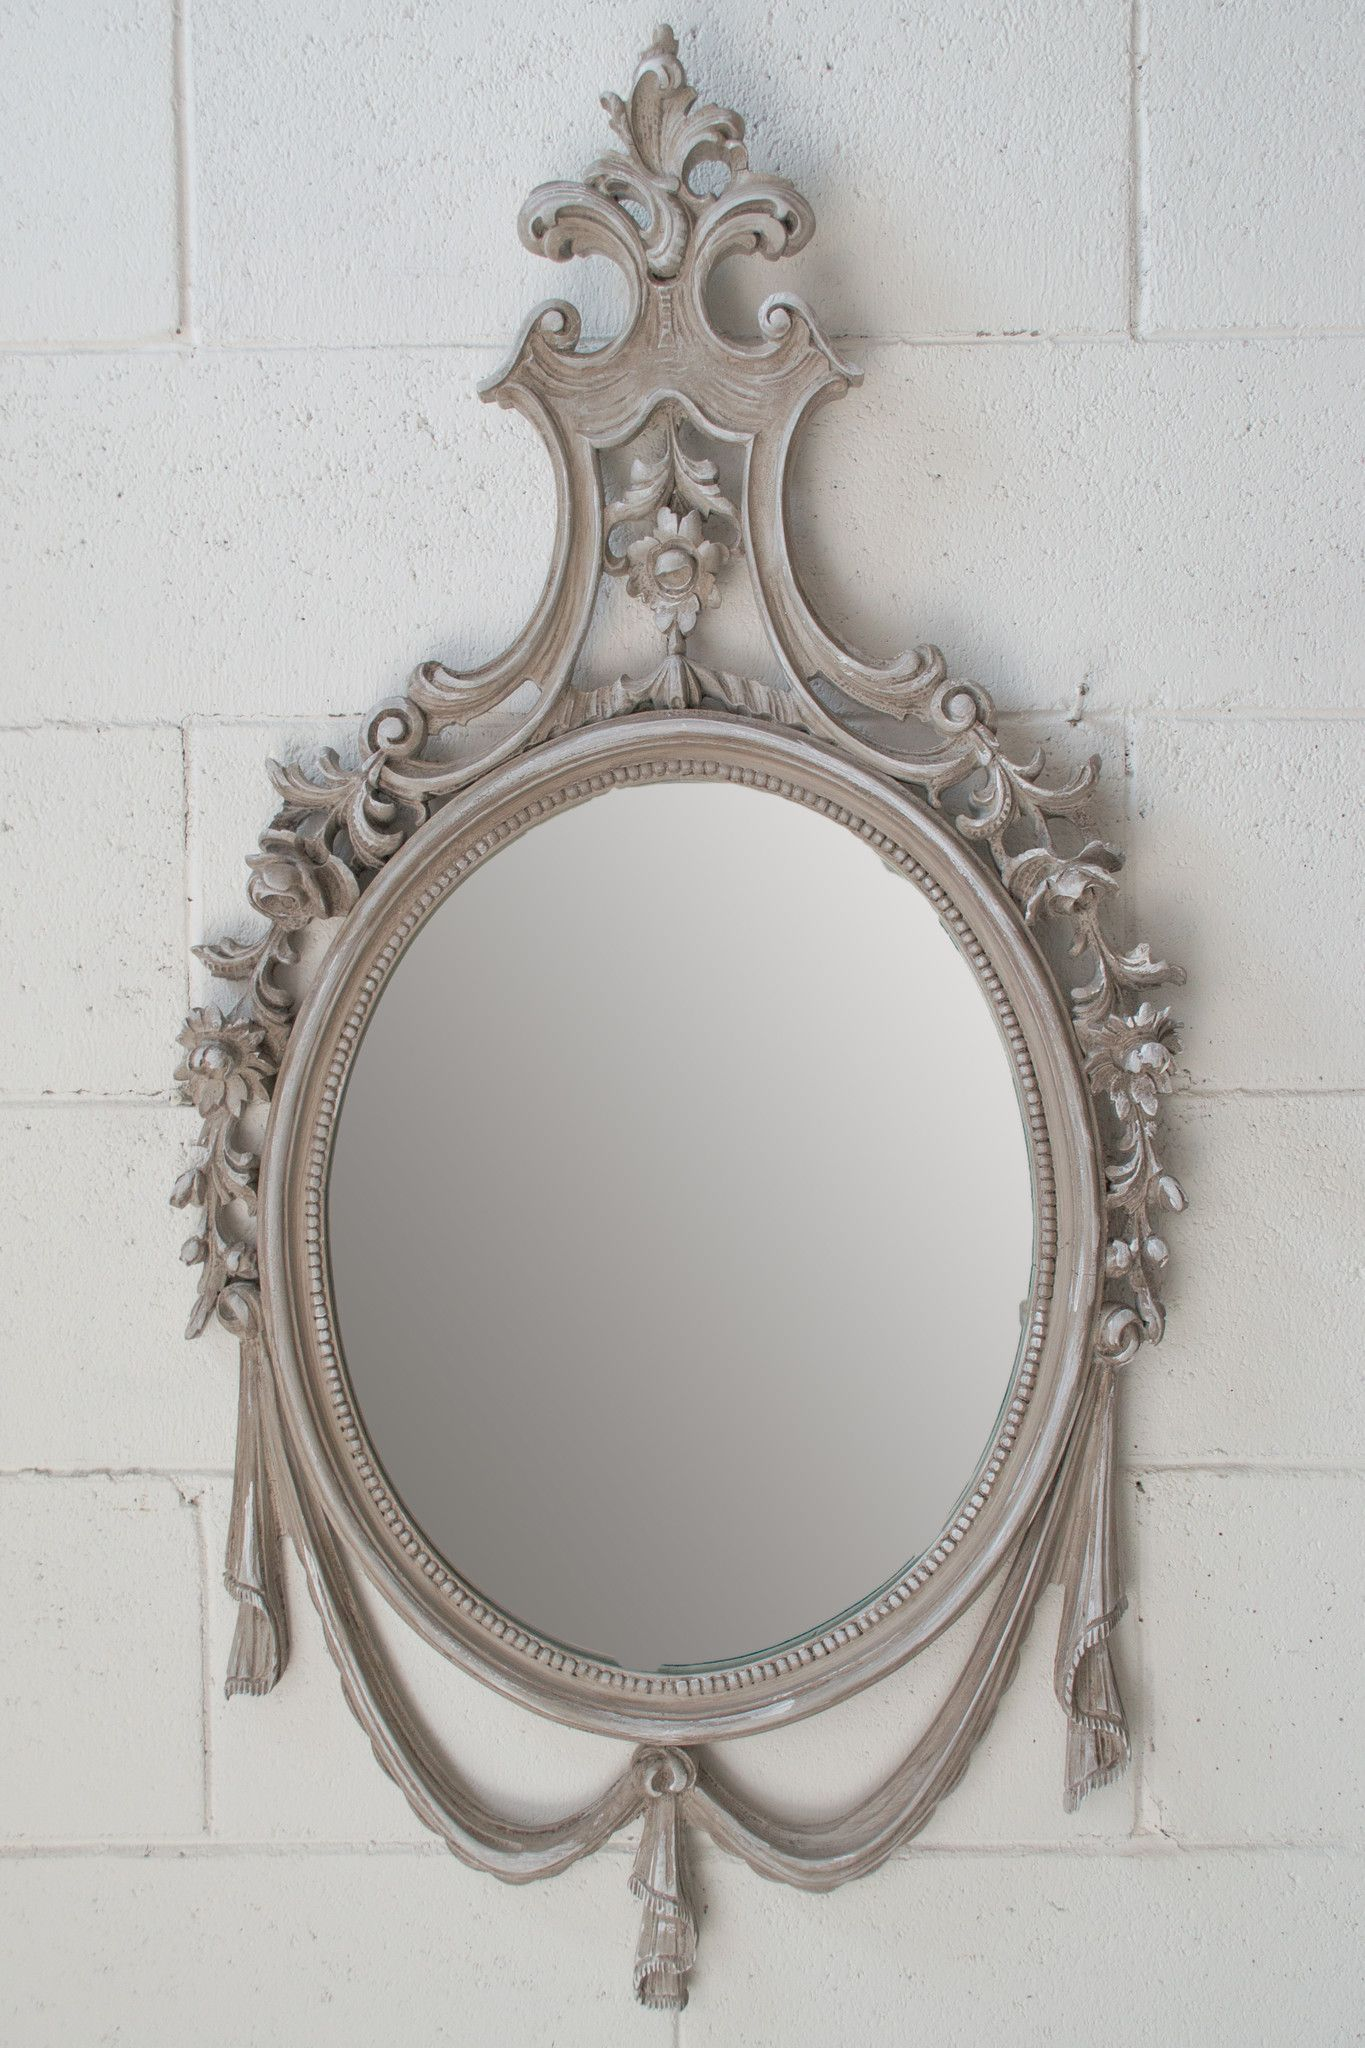 40 specchio vintage anni 39 50 arredamento erashop - Specchio ovale vintage ...